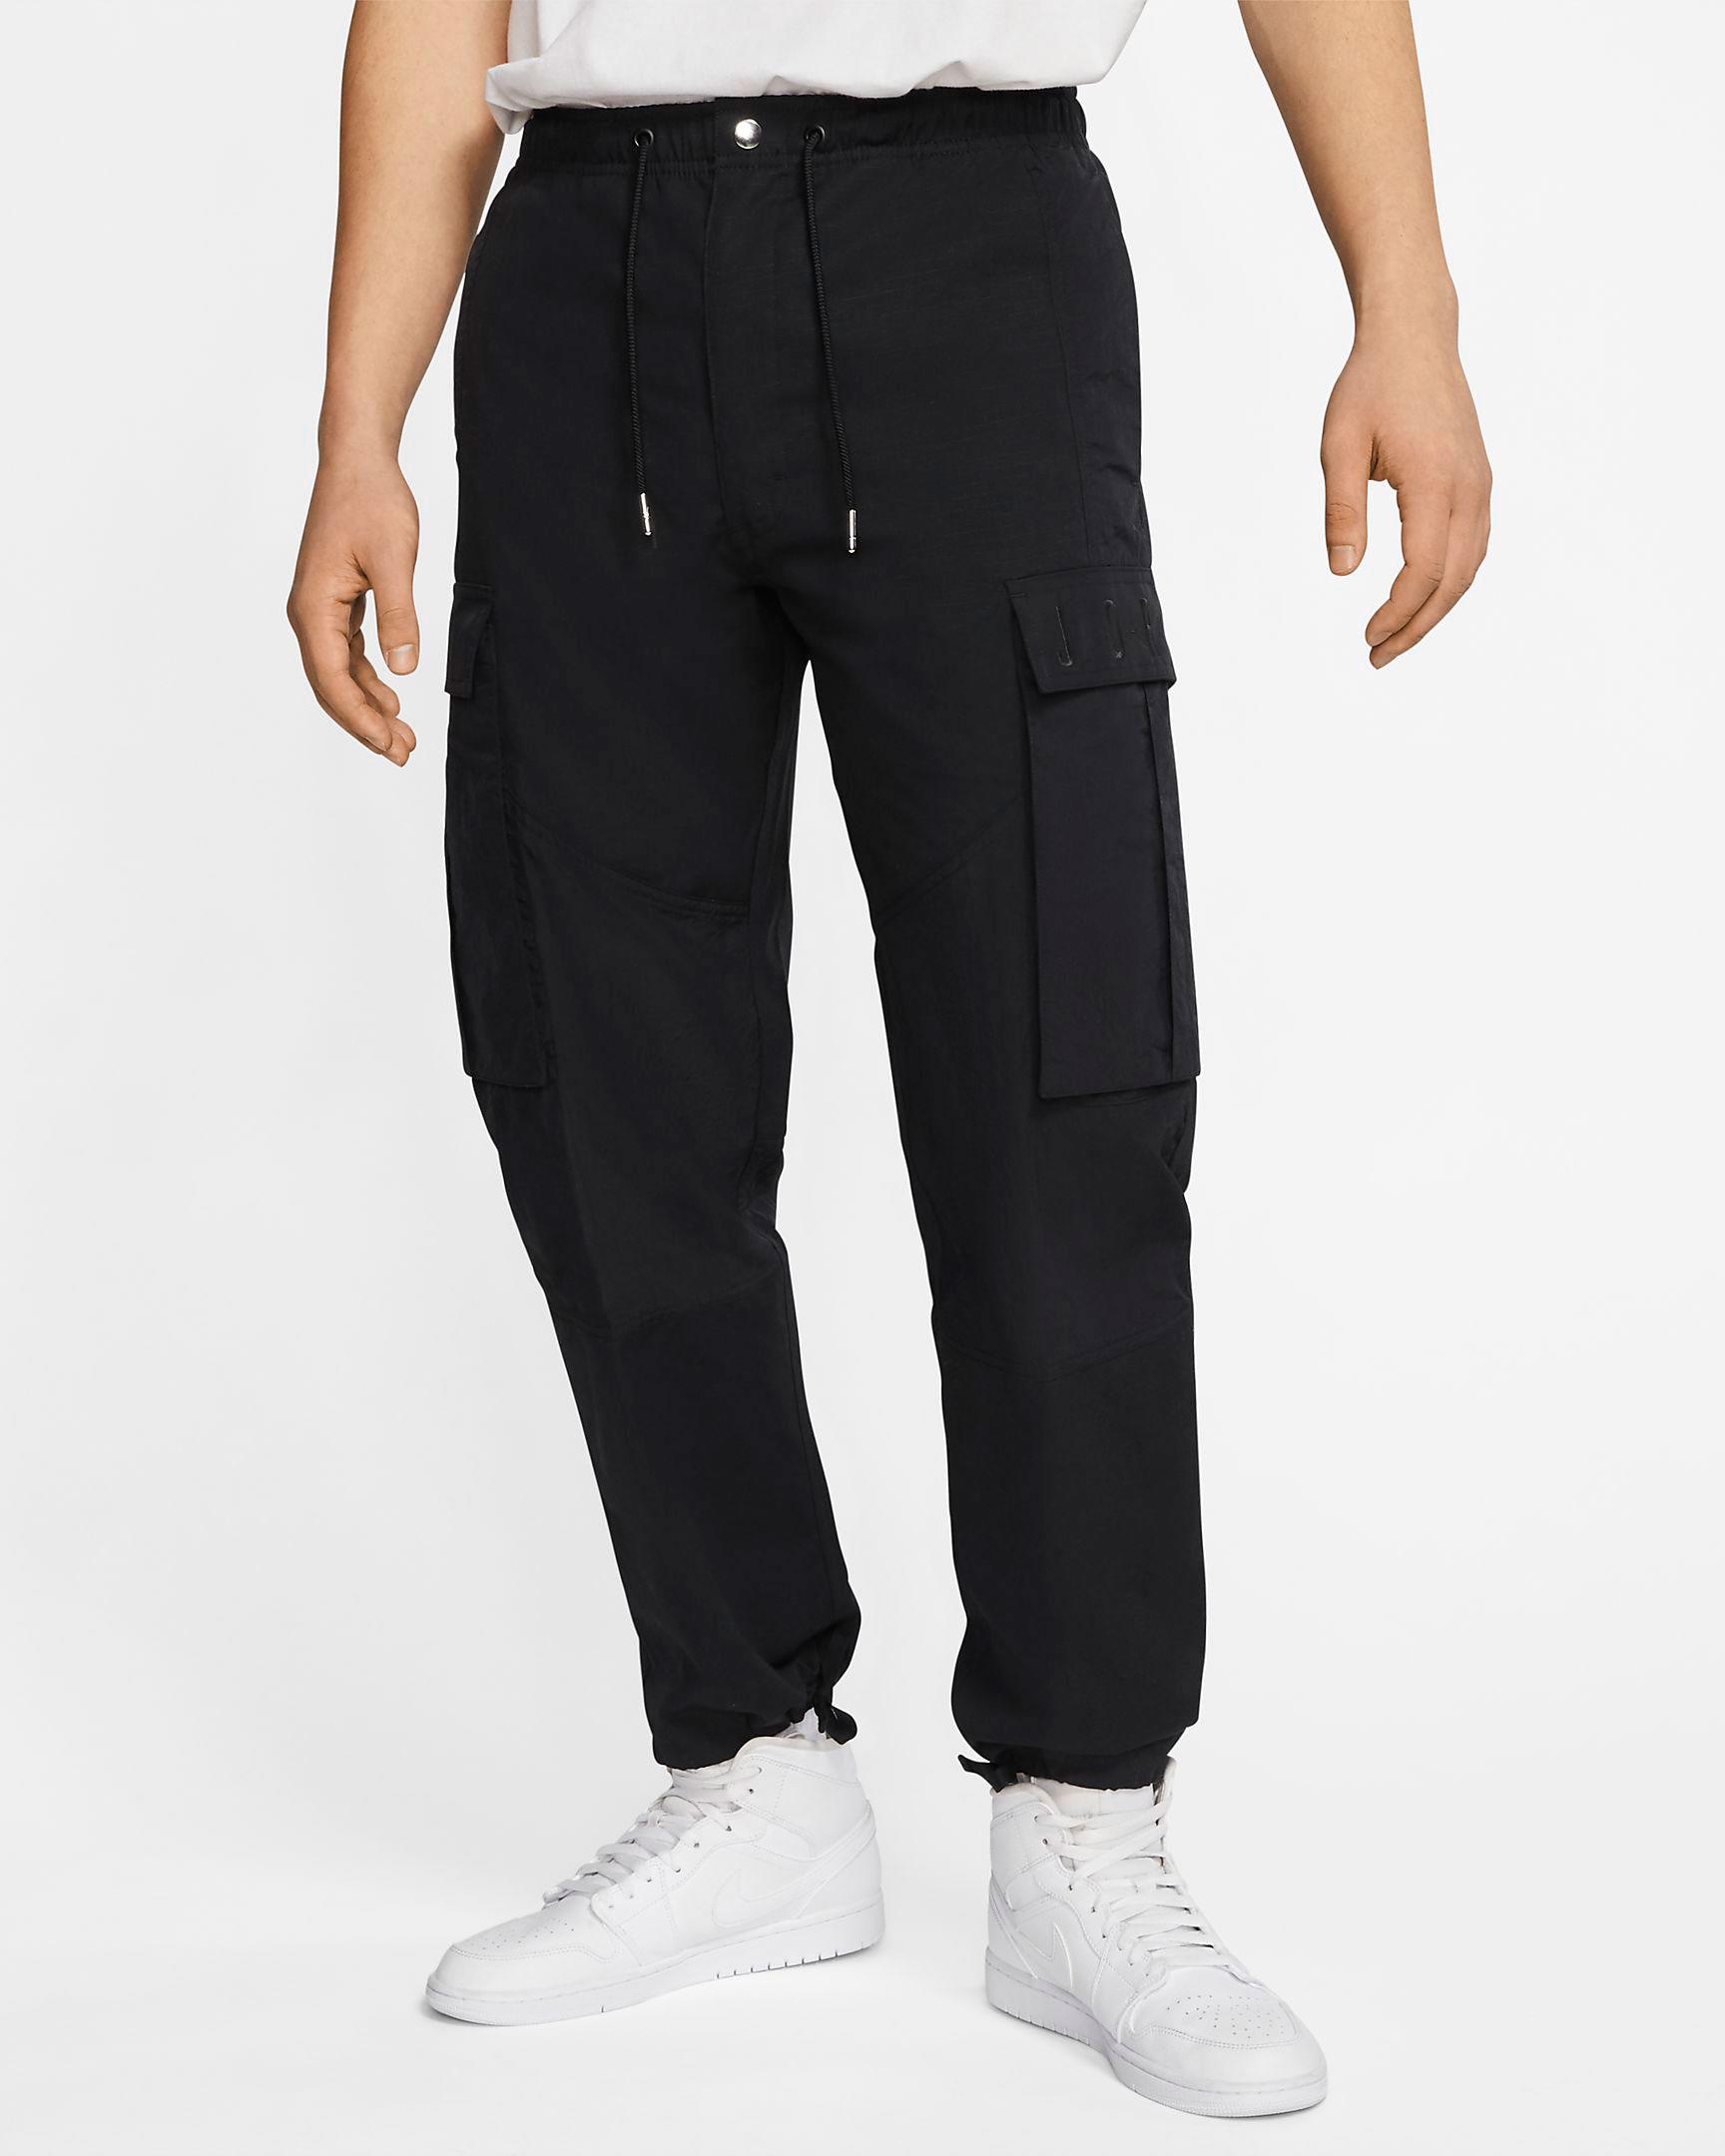 jordan-black-cargo-pants-1